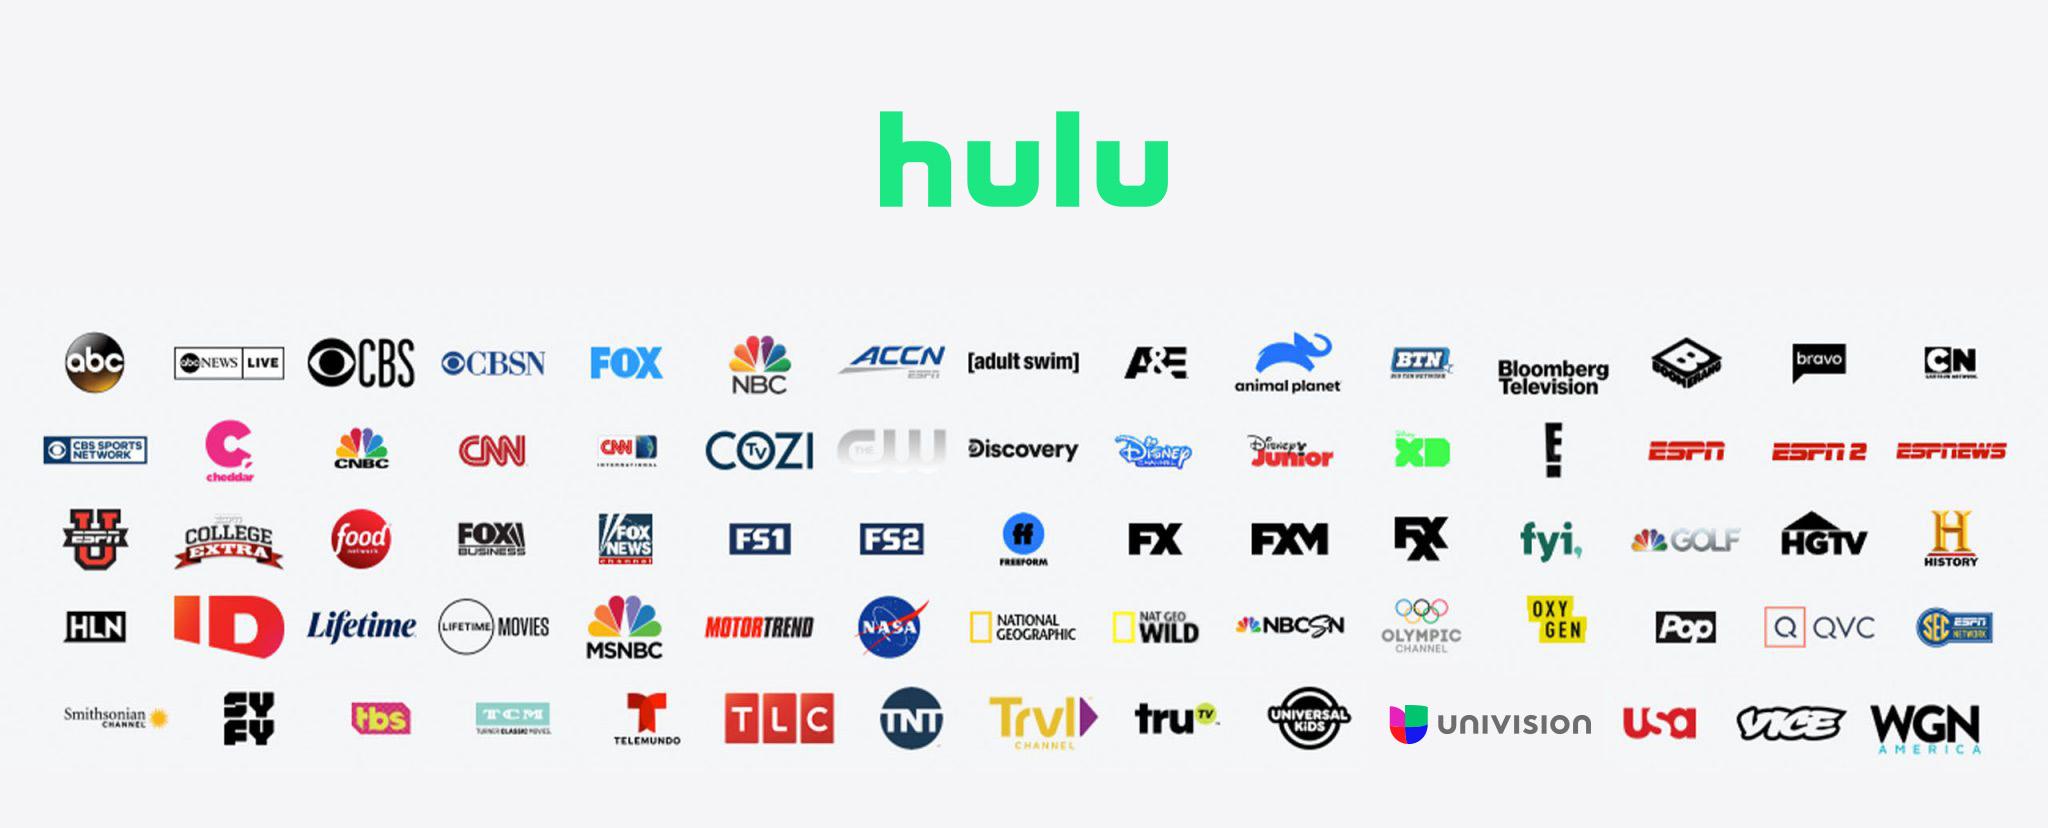 hulu-channels-updated